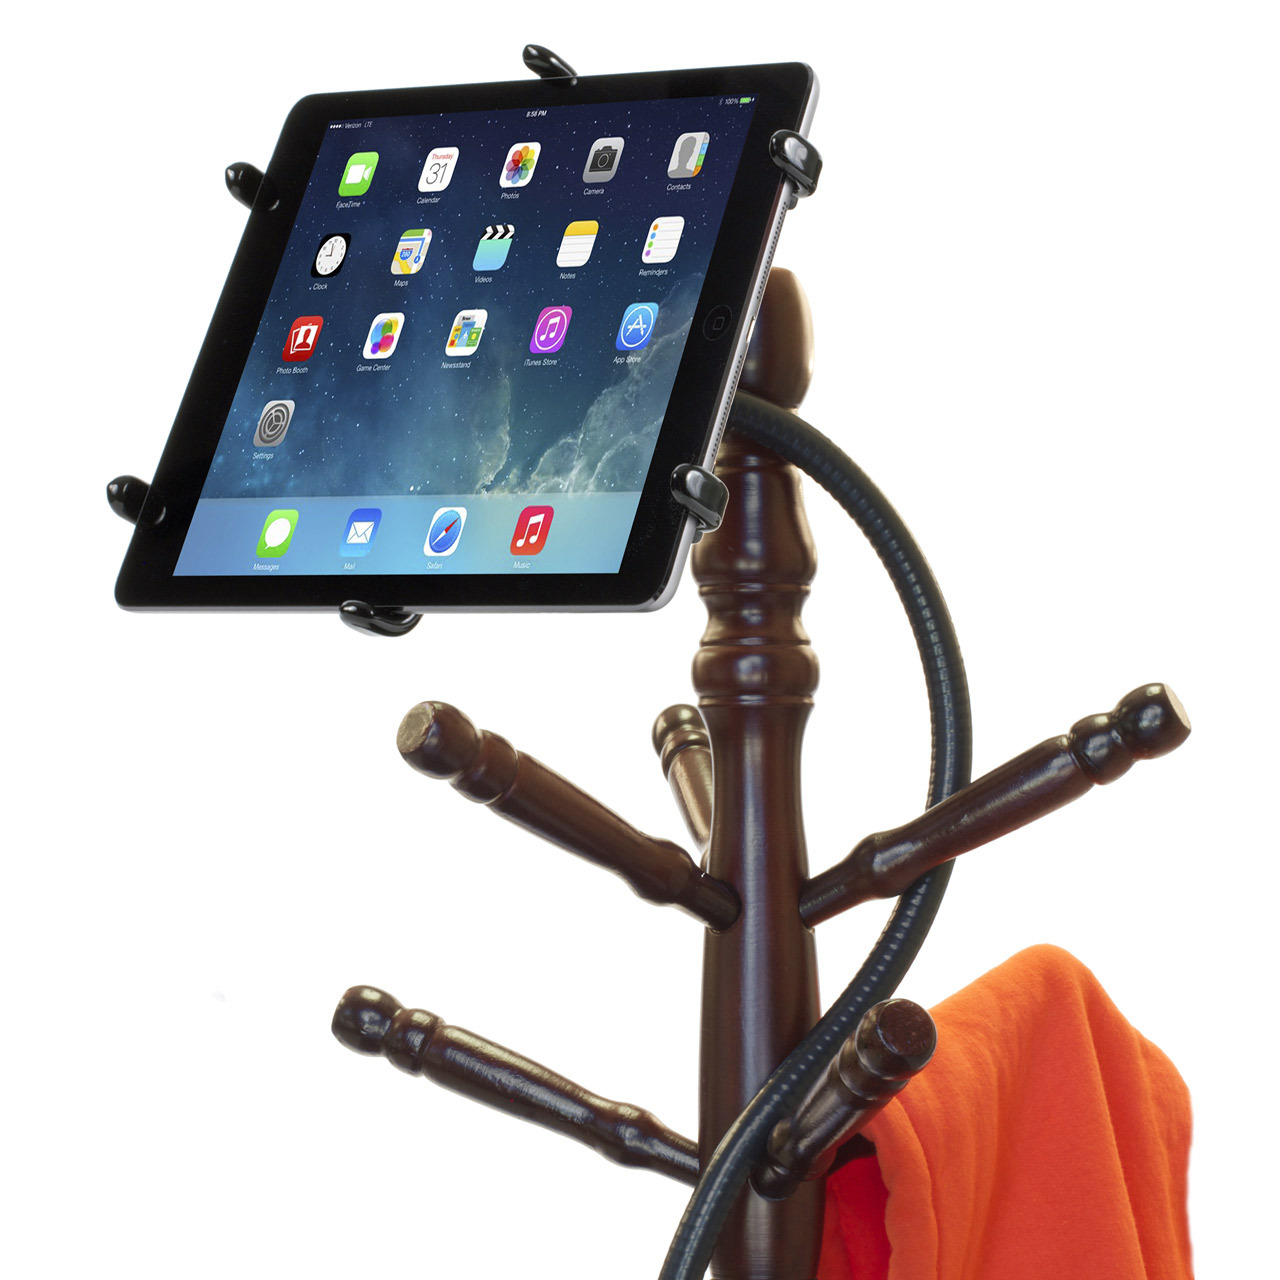 PED4-Coil IPA10 iPad Stand Flexible Gooseneck & Pivoting Holder